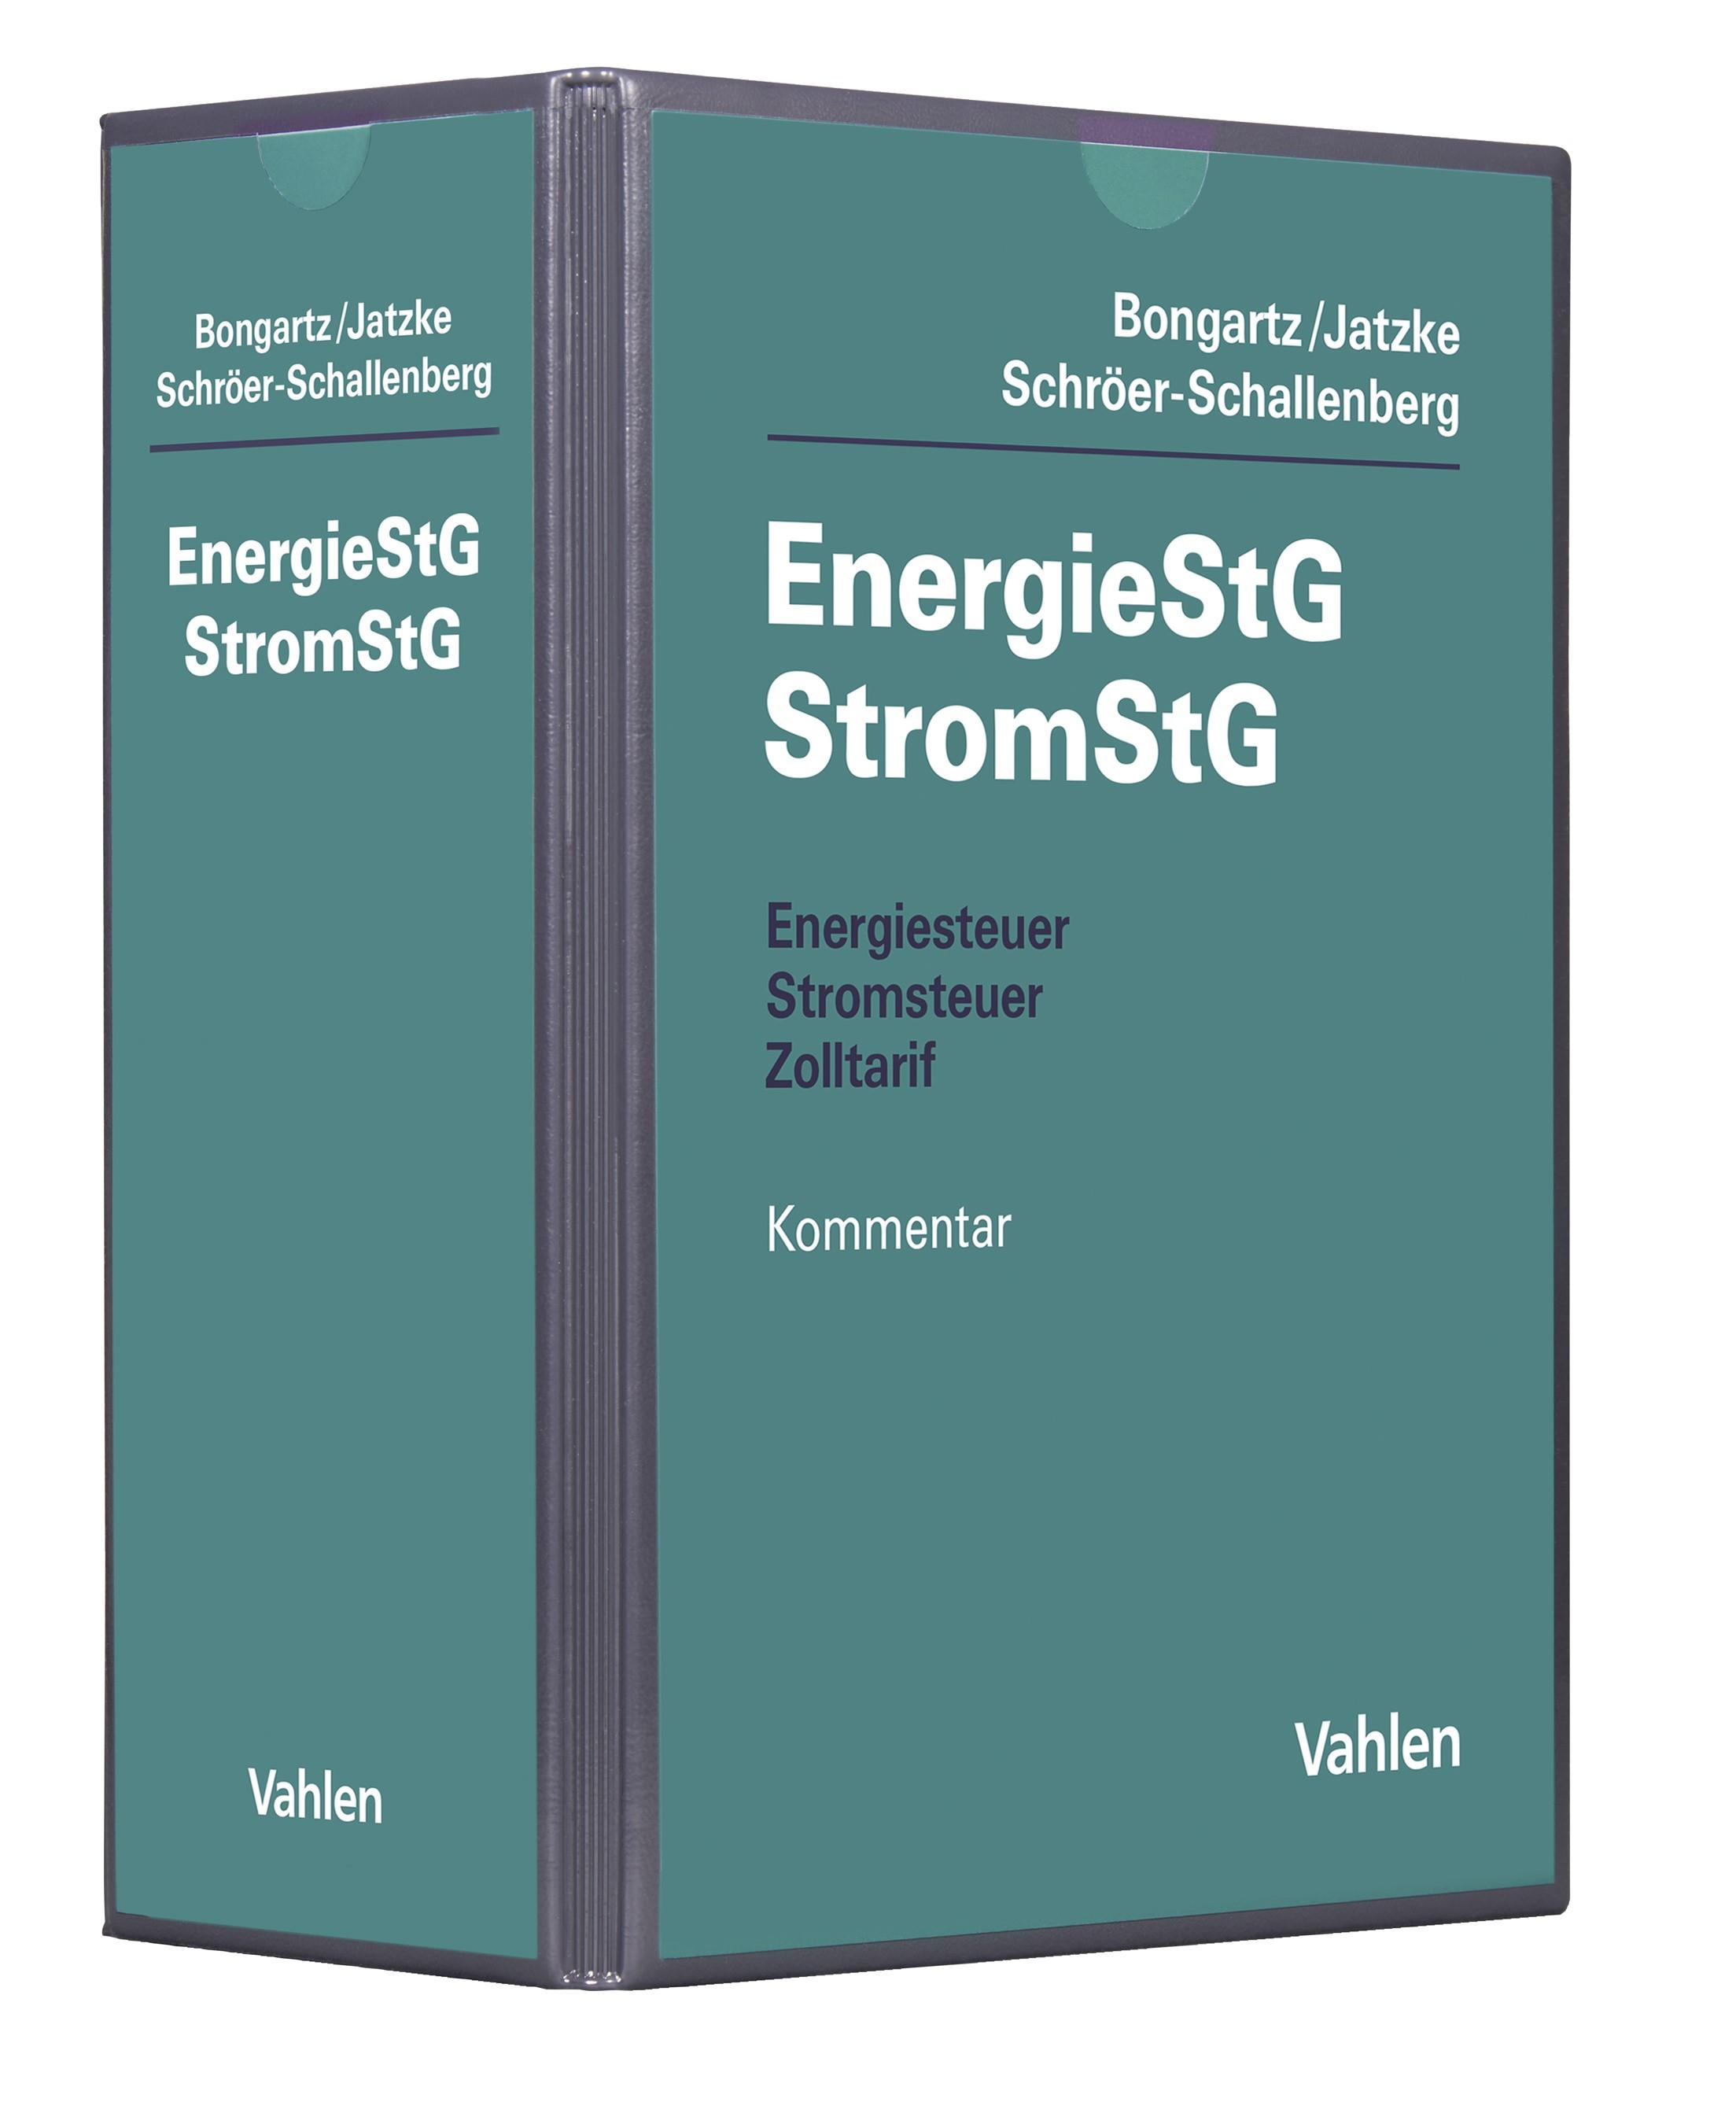 Energiesteuer, Stromsteuer, Zolltarif: EnergieStG, StromStG   Bongartz / Jatzke / Schröer-Schallenberg   14. Auflage (Cover)